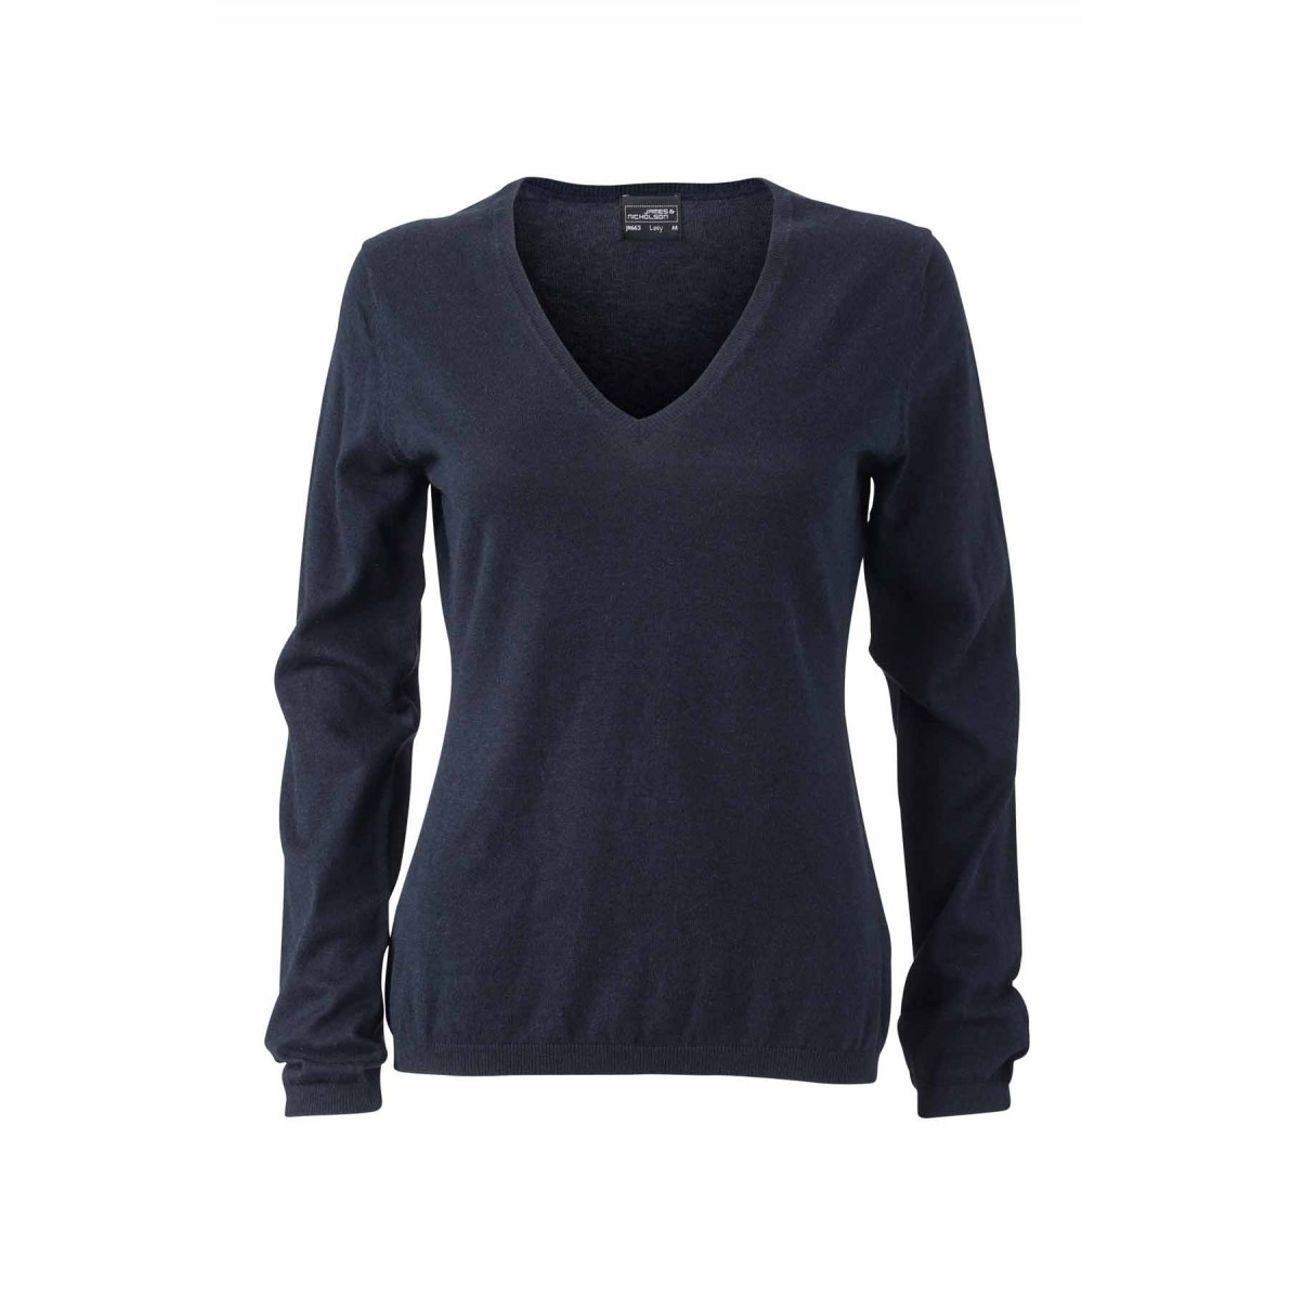 best loved 0dd24 7cda0 pull-classique-cachemire-col-v---femme---jn663---bleu-marine 1 v1.jpeg